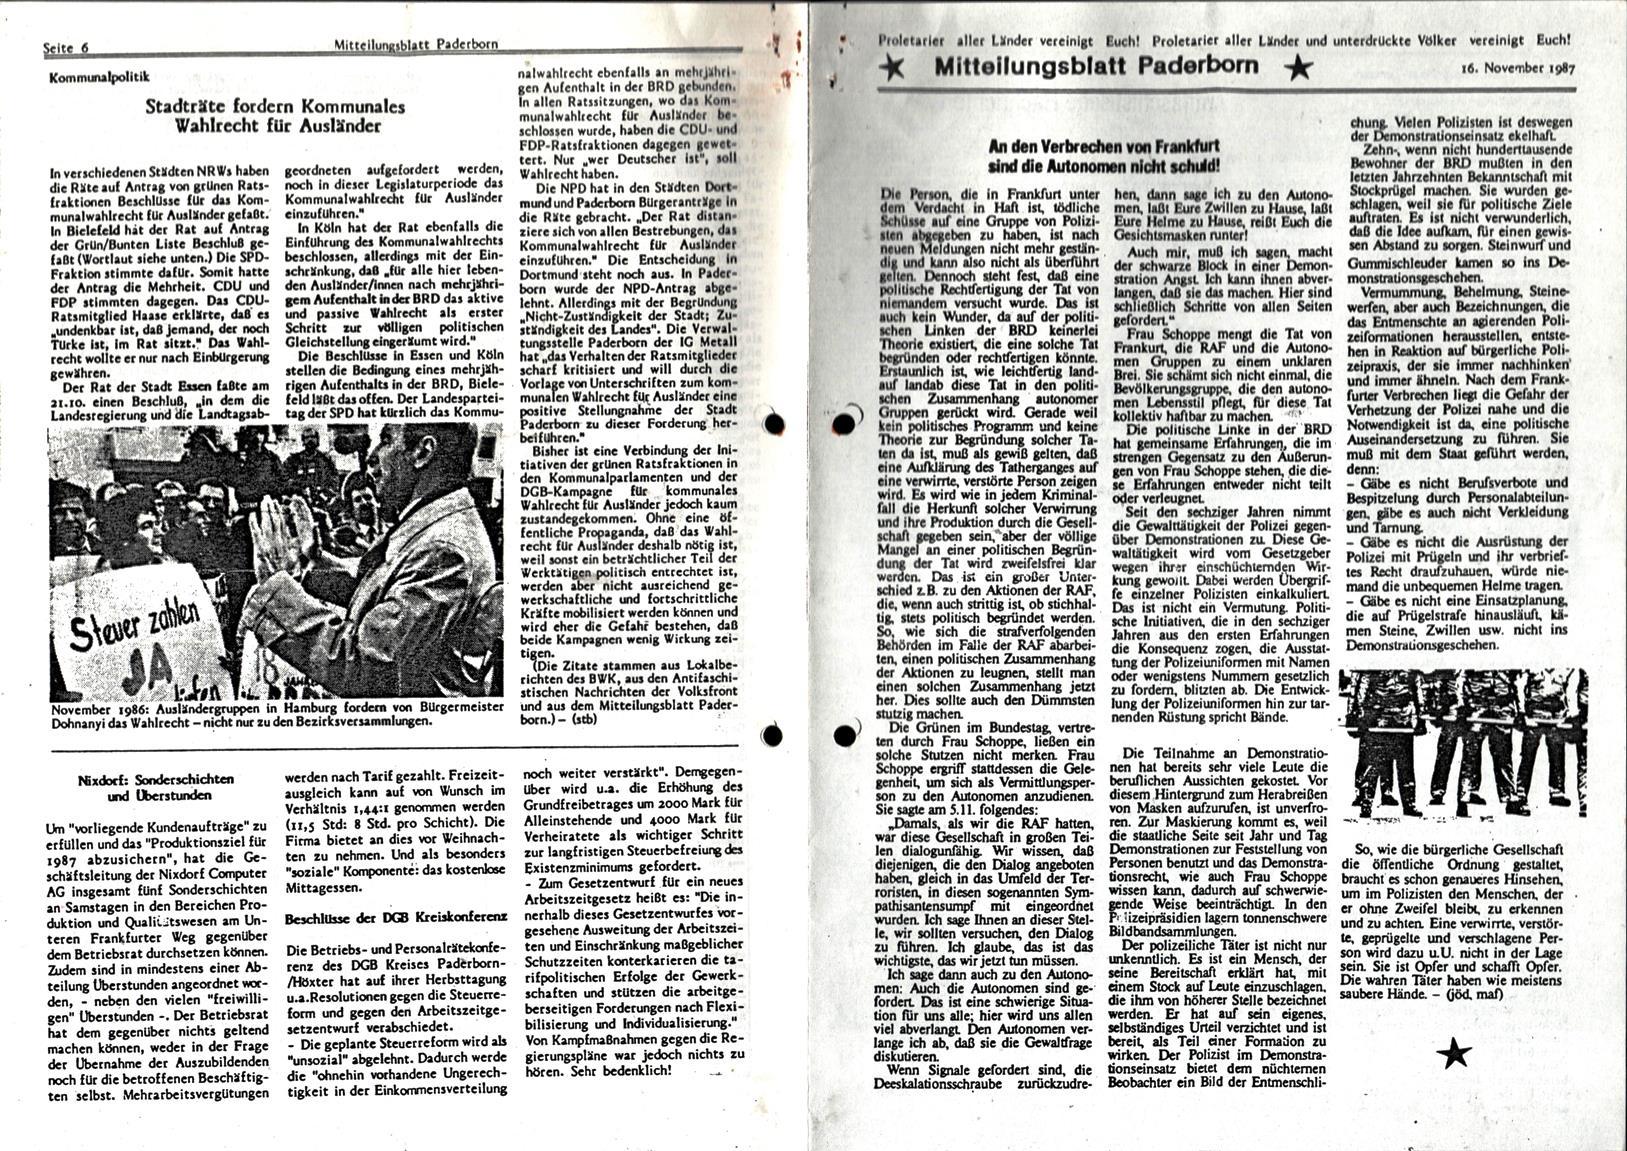 Paderborn_BWK_Mitteilungsblatt_19871116_001